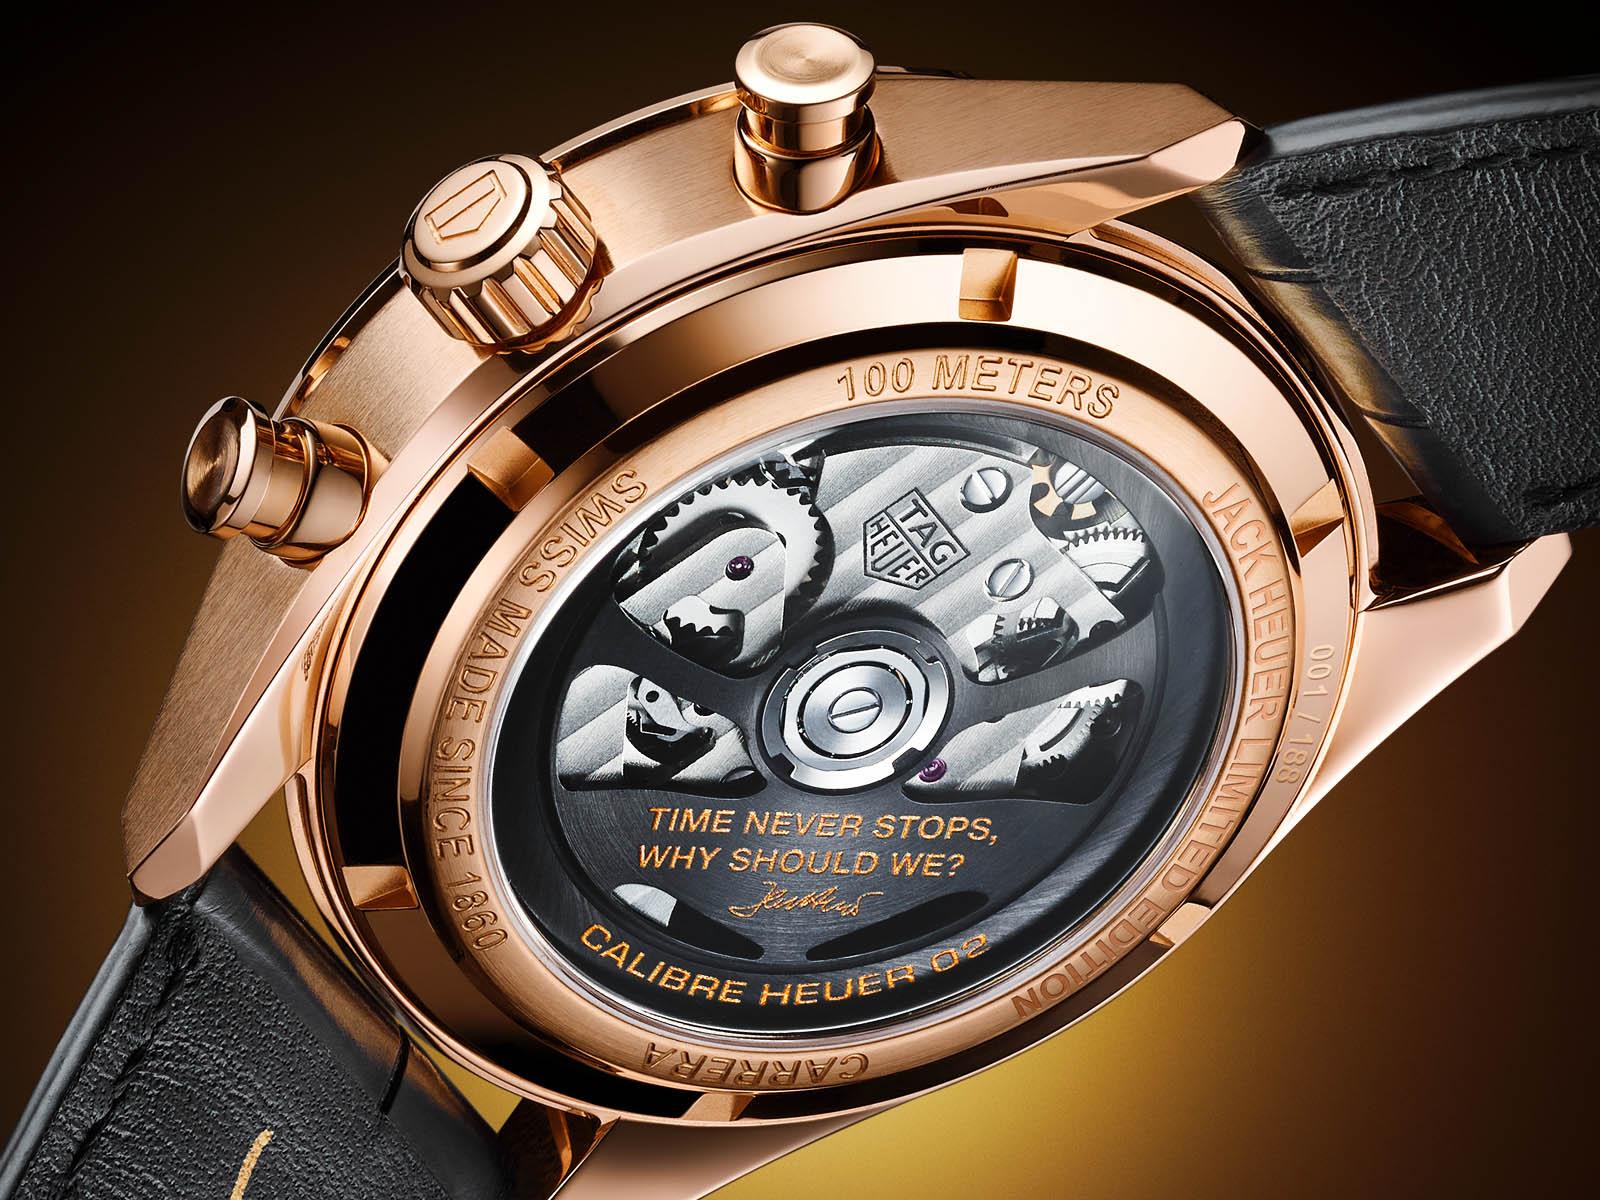 cbn2041-fc8306-tag-heuer-carrera-chronograph-jack-heuer-birthday-gold-6.jpg